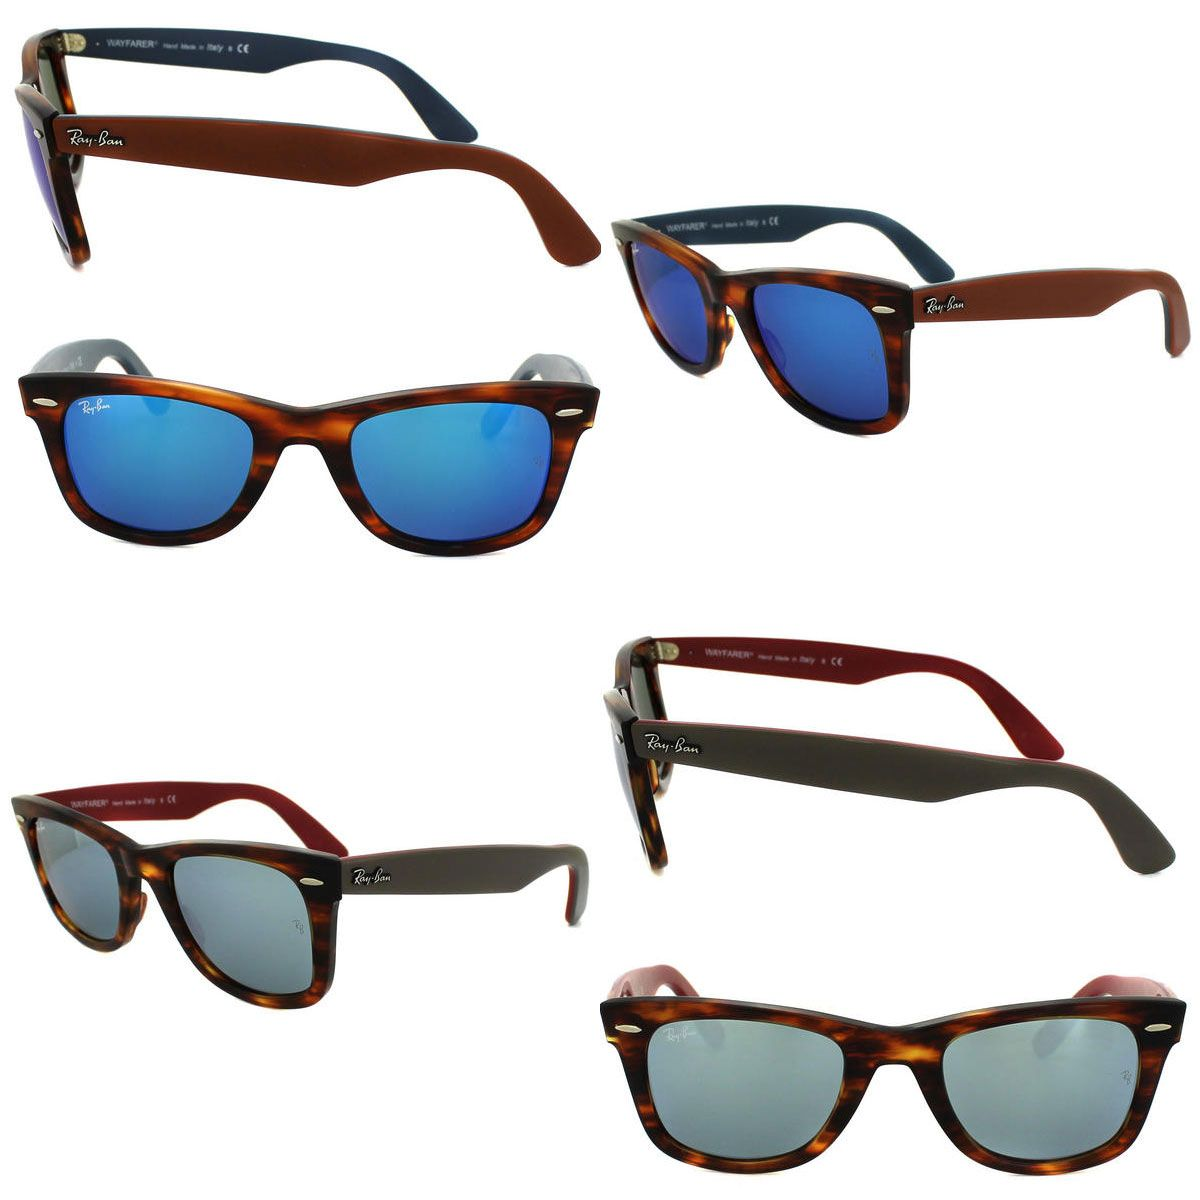 Ray-Ban Wayfarer 2140 Sunglasses | Pinterest